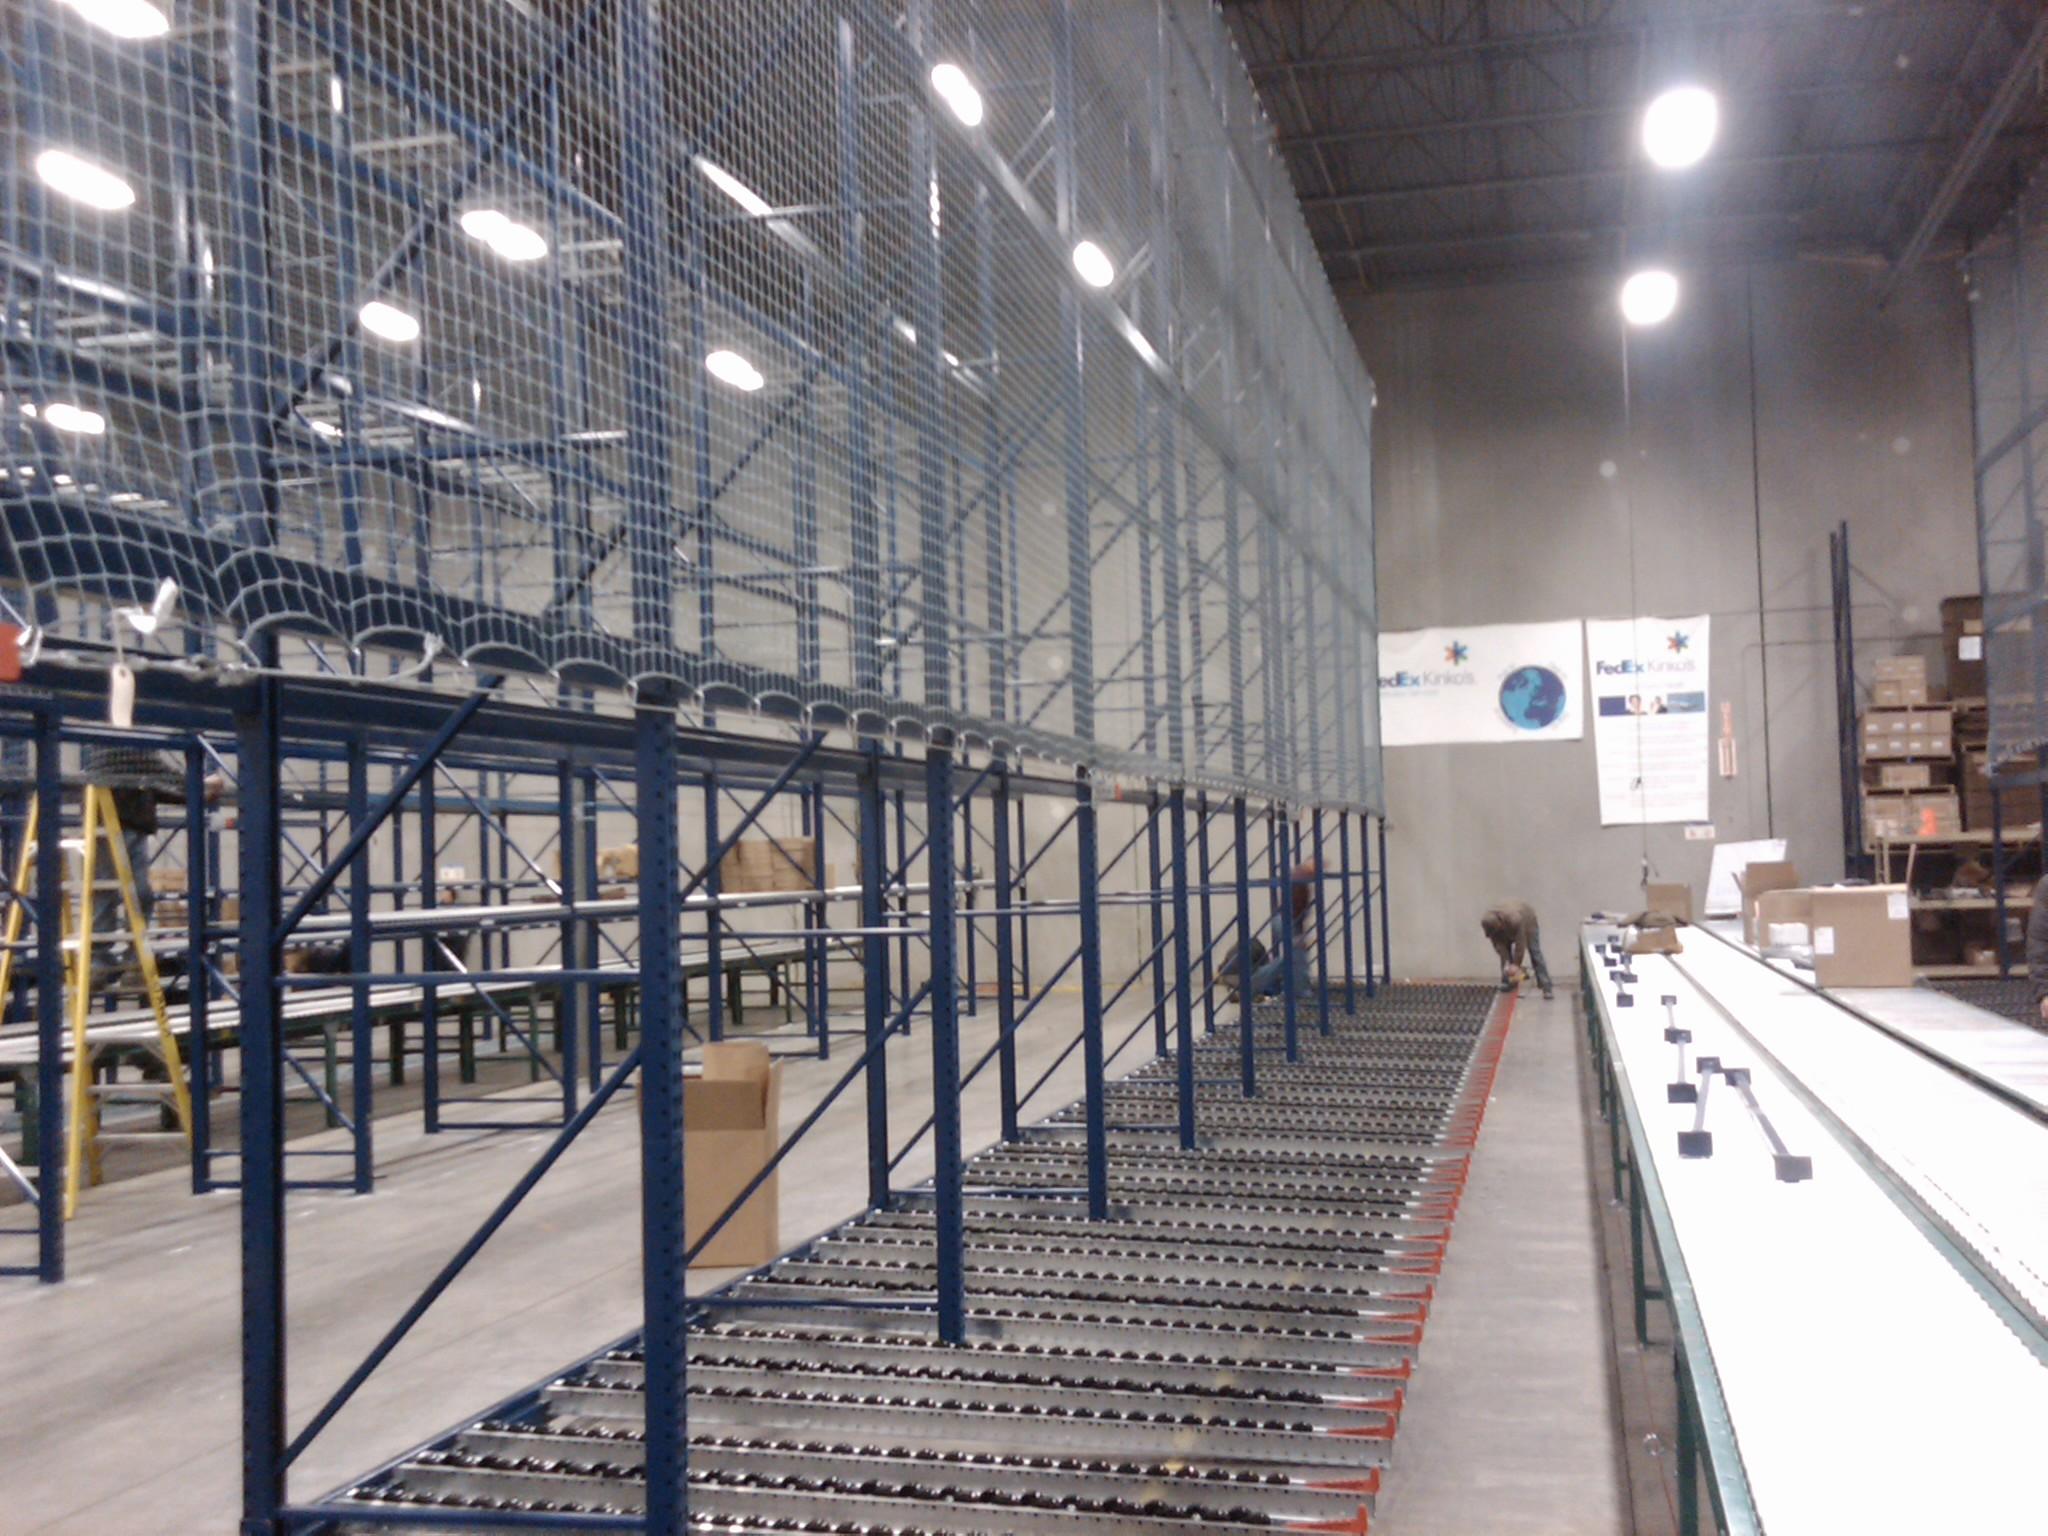 Pallet Rack Installation Mezzanine Installation